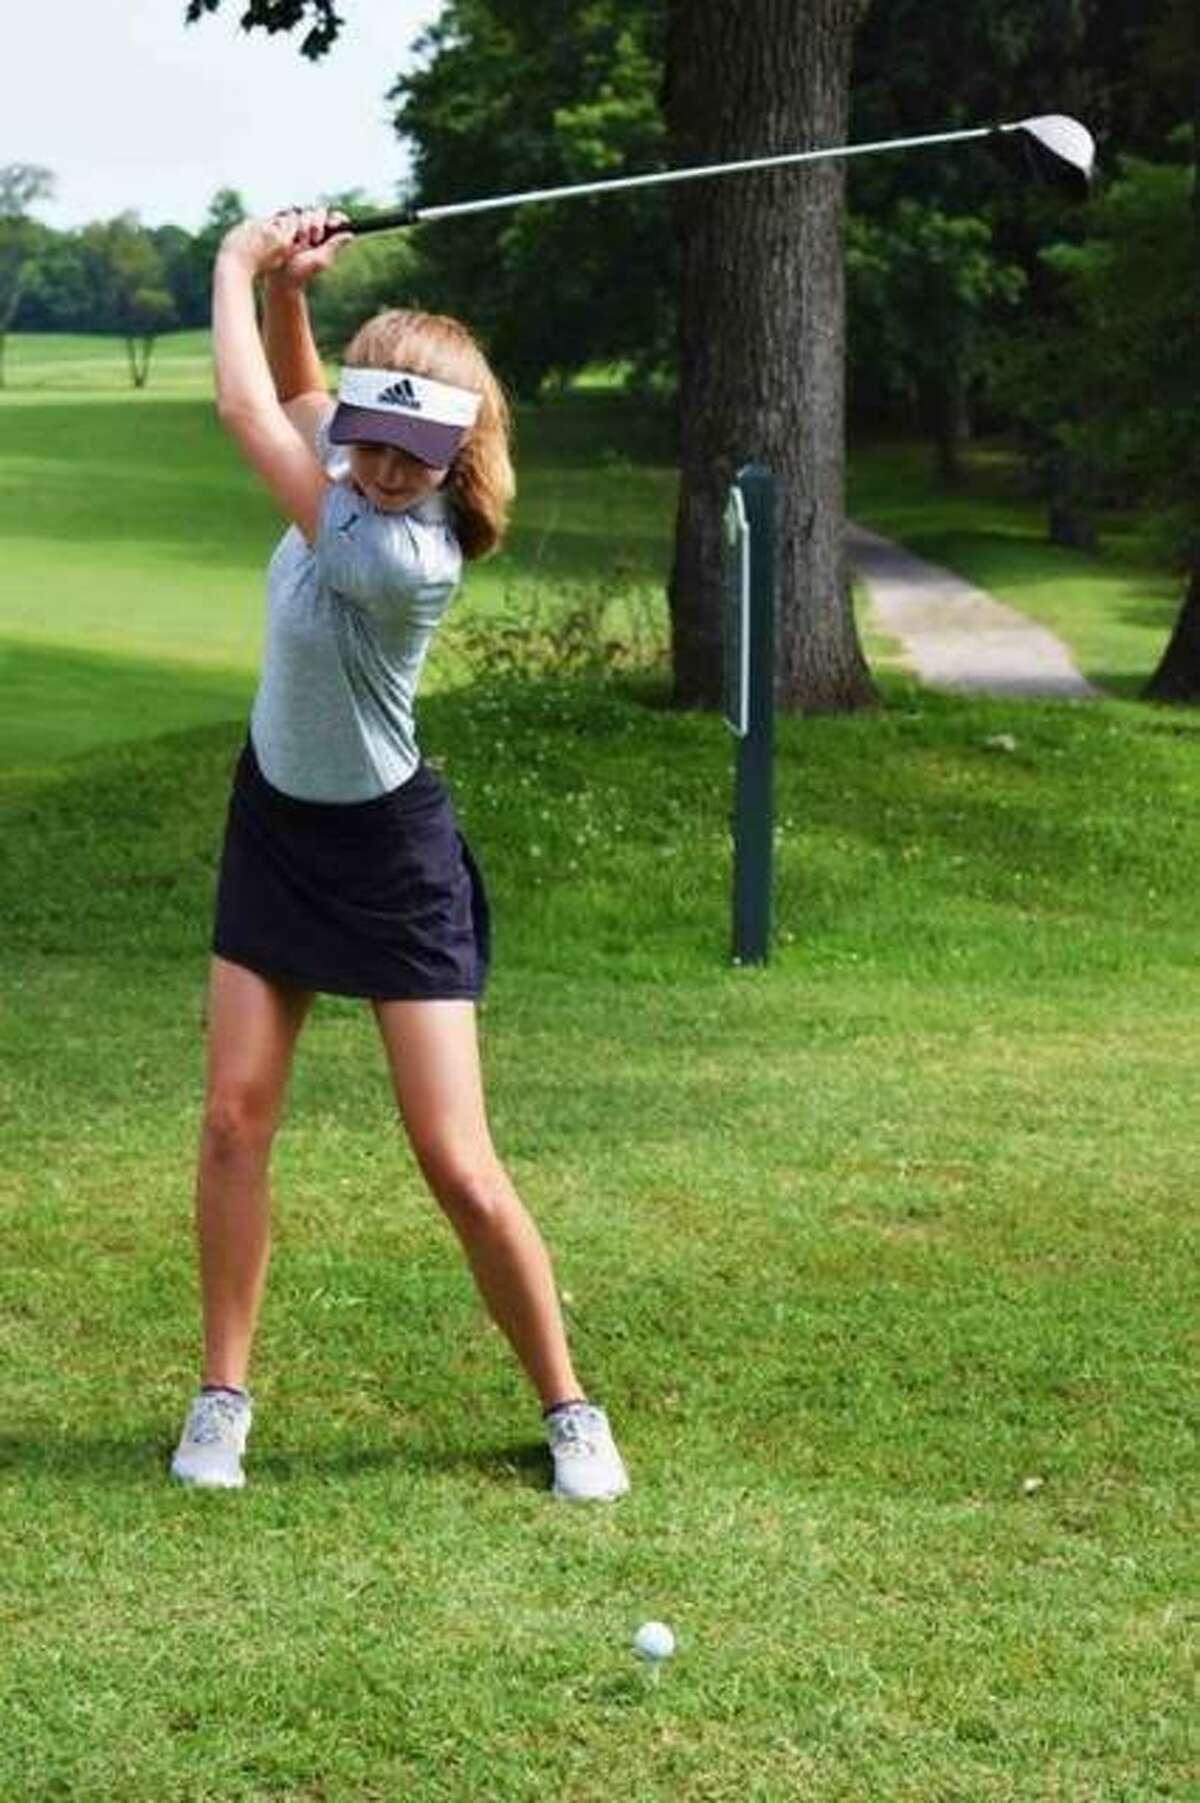 FMCHS sophomore Ellie Hyten practices her tee shots at Oak Brook Golf Club in Edwardsville.